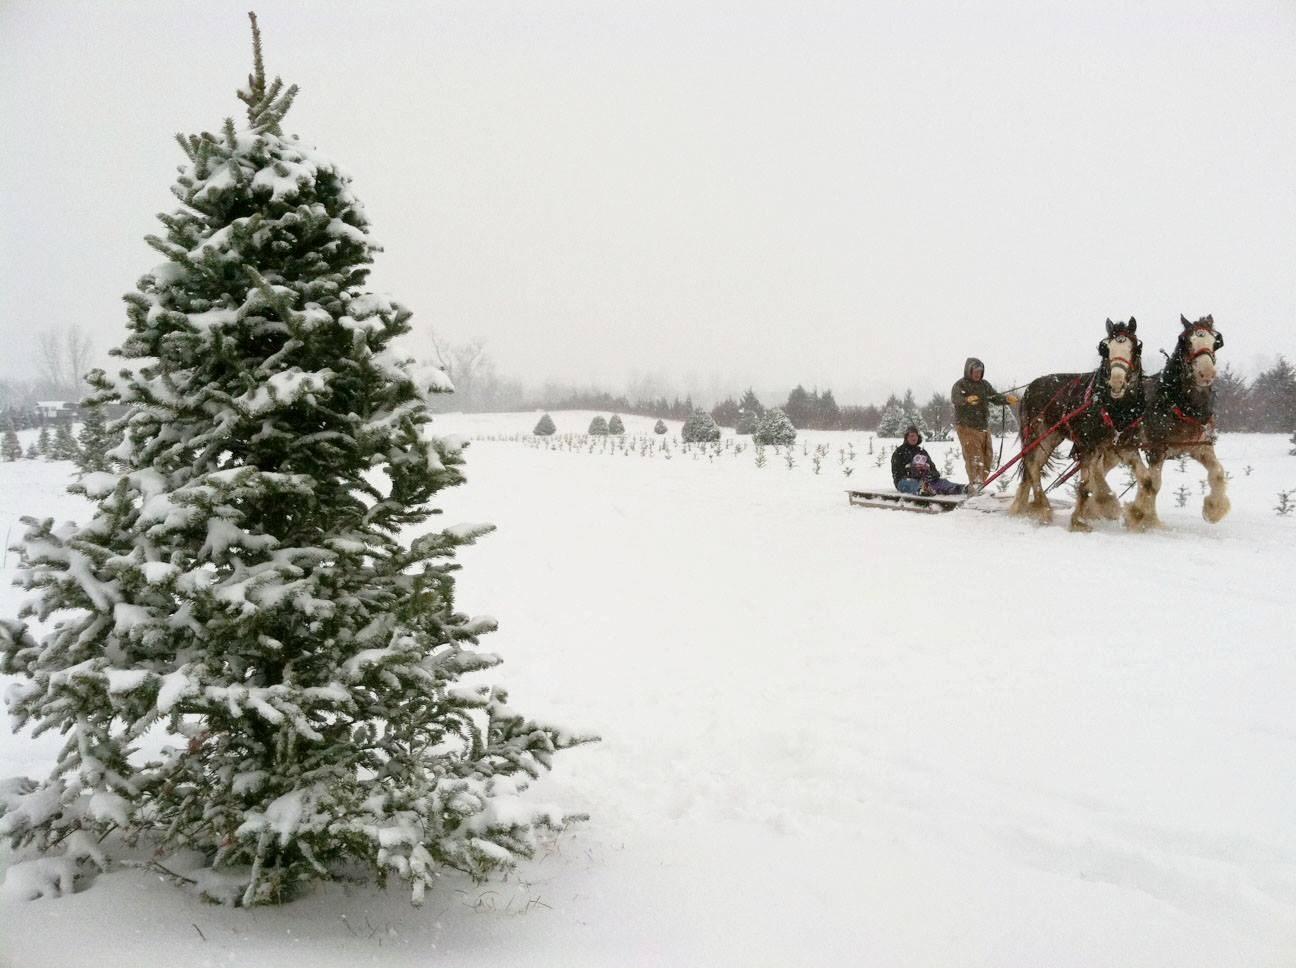 Kaleidoscope Farms LLC christmas tree farm | ChristmasTreeFarms.net